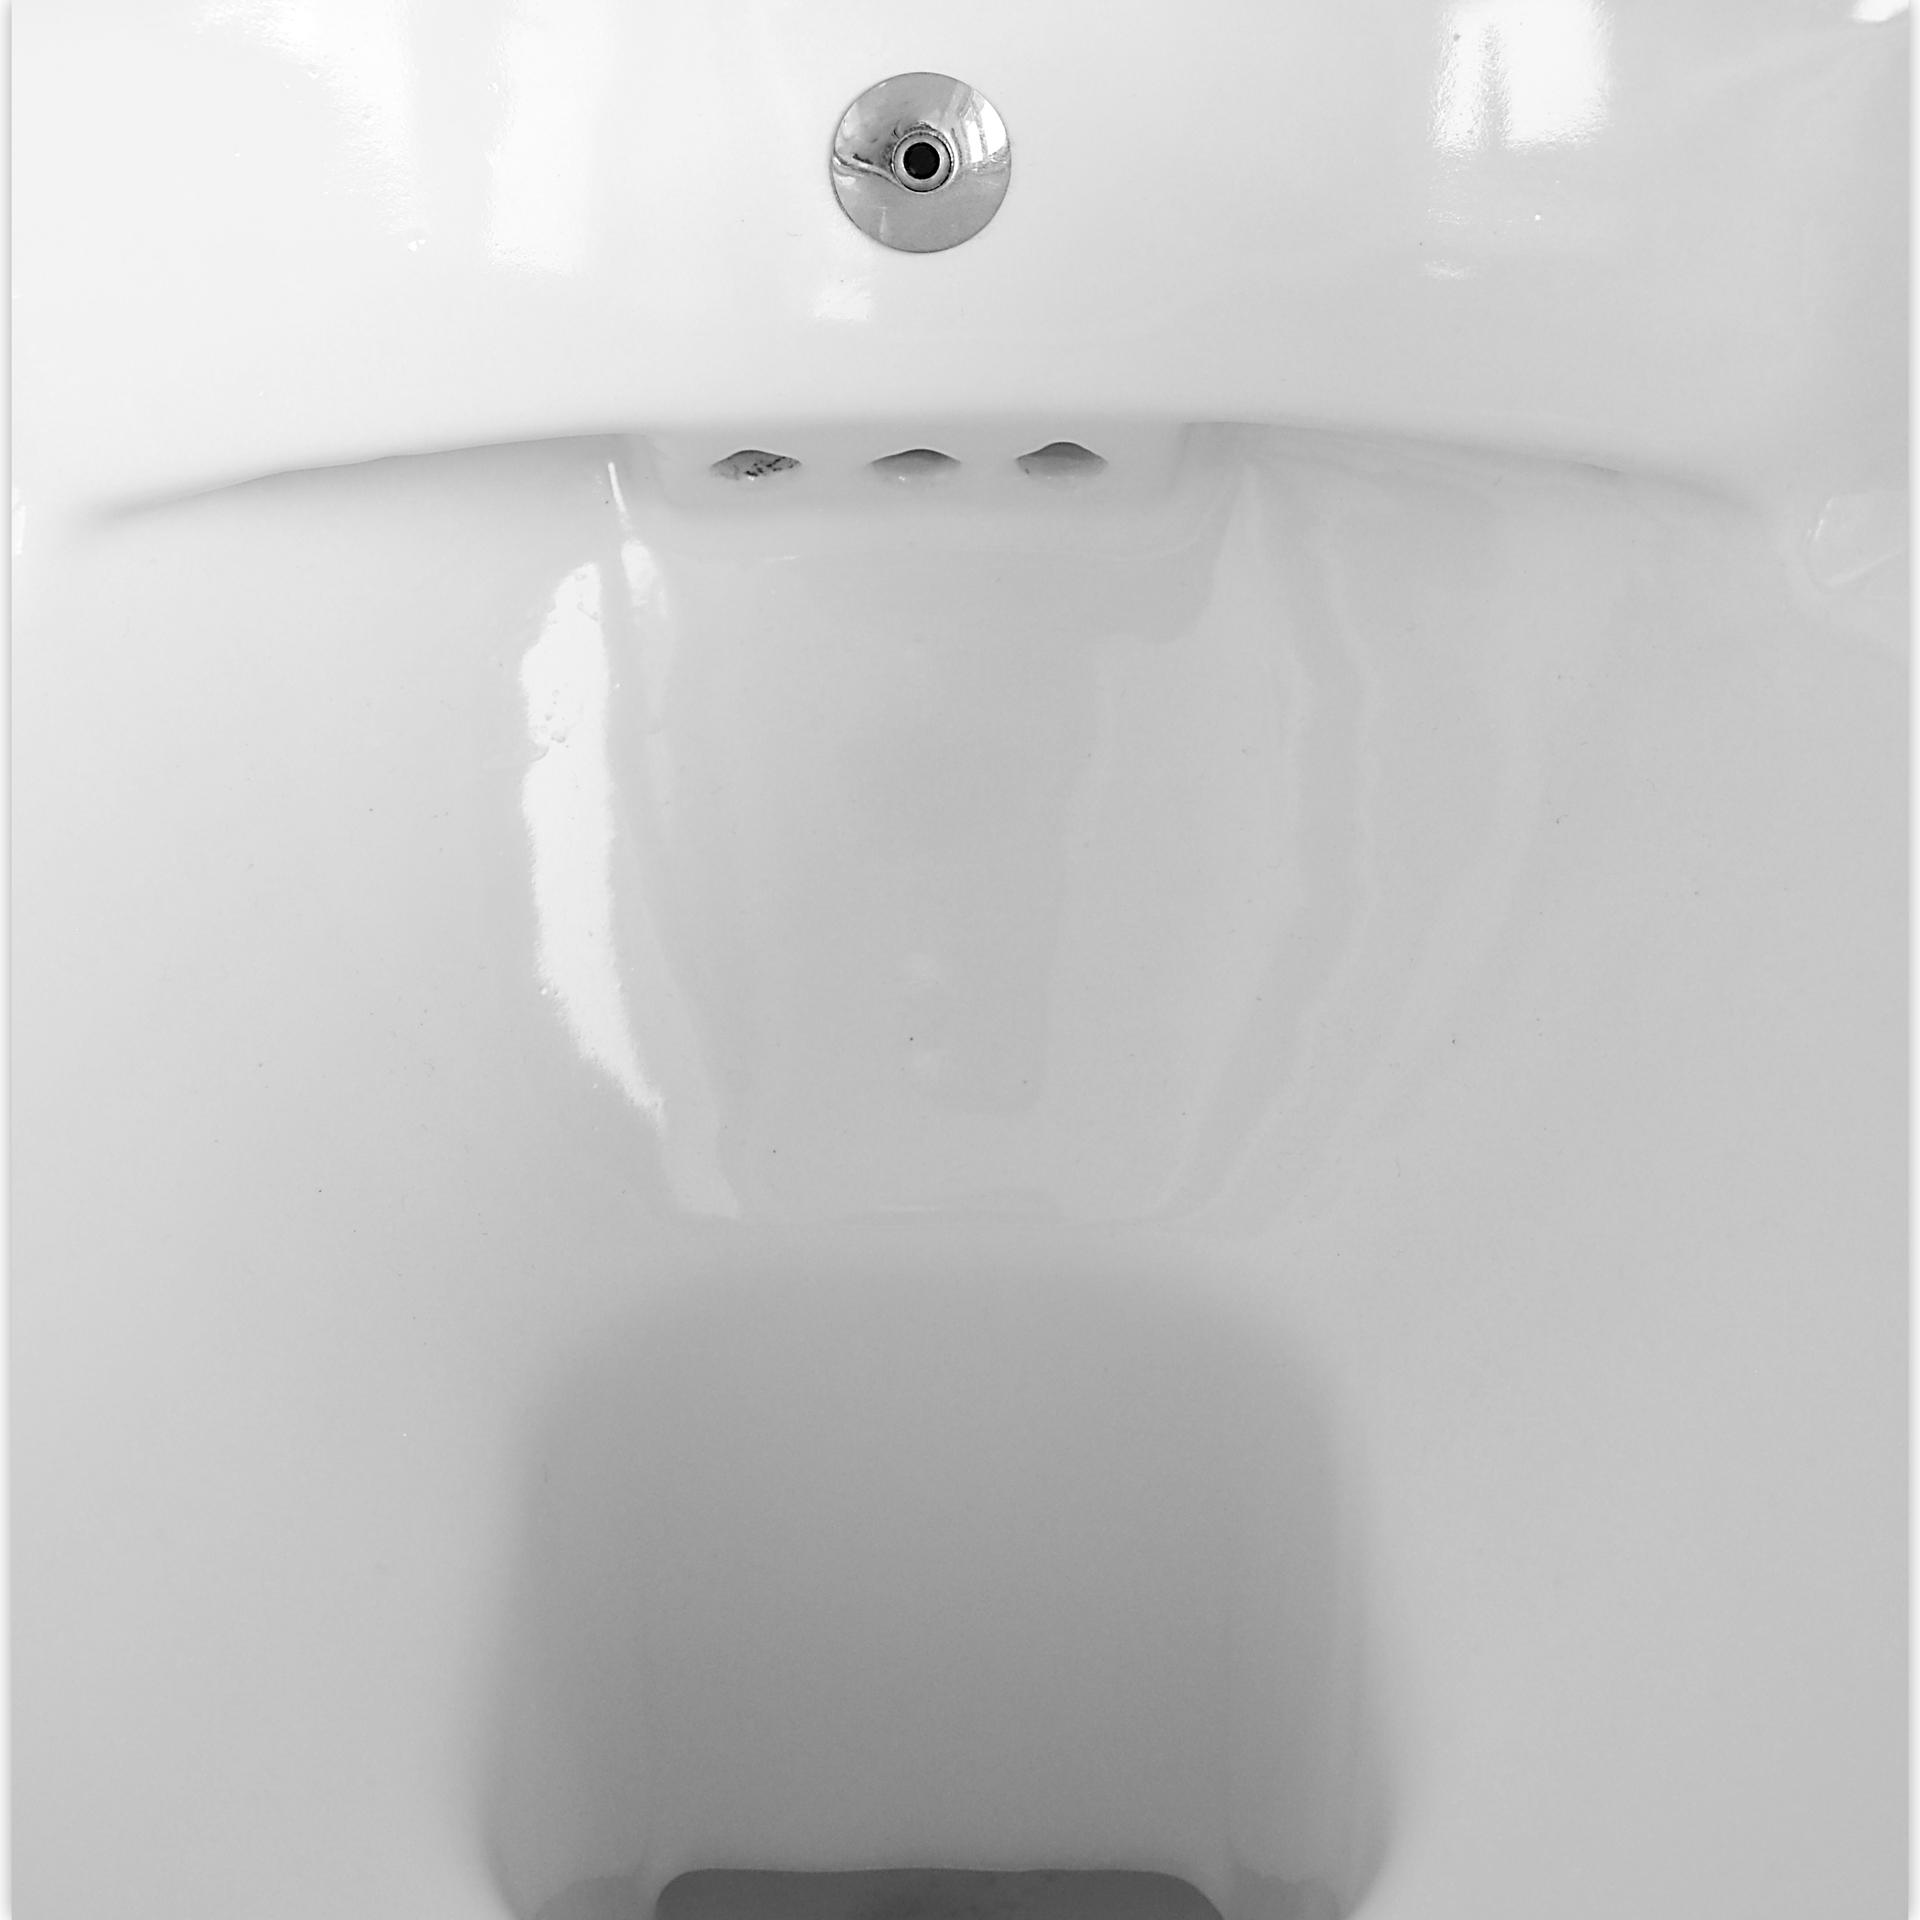 Verwonderend WC met bidet, +16 Mooi bidet WC & Vrijhangend WC met bidet - Sanitear RJ-16